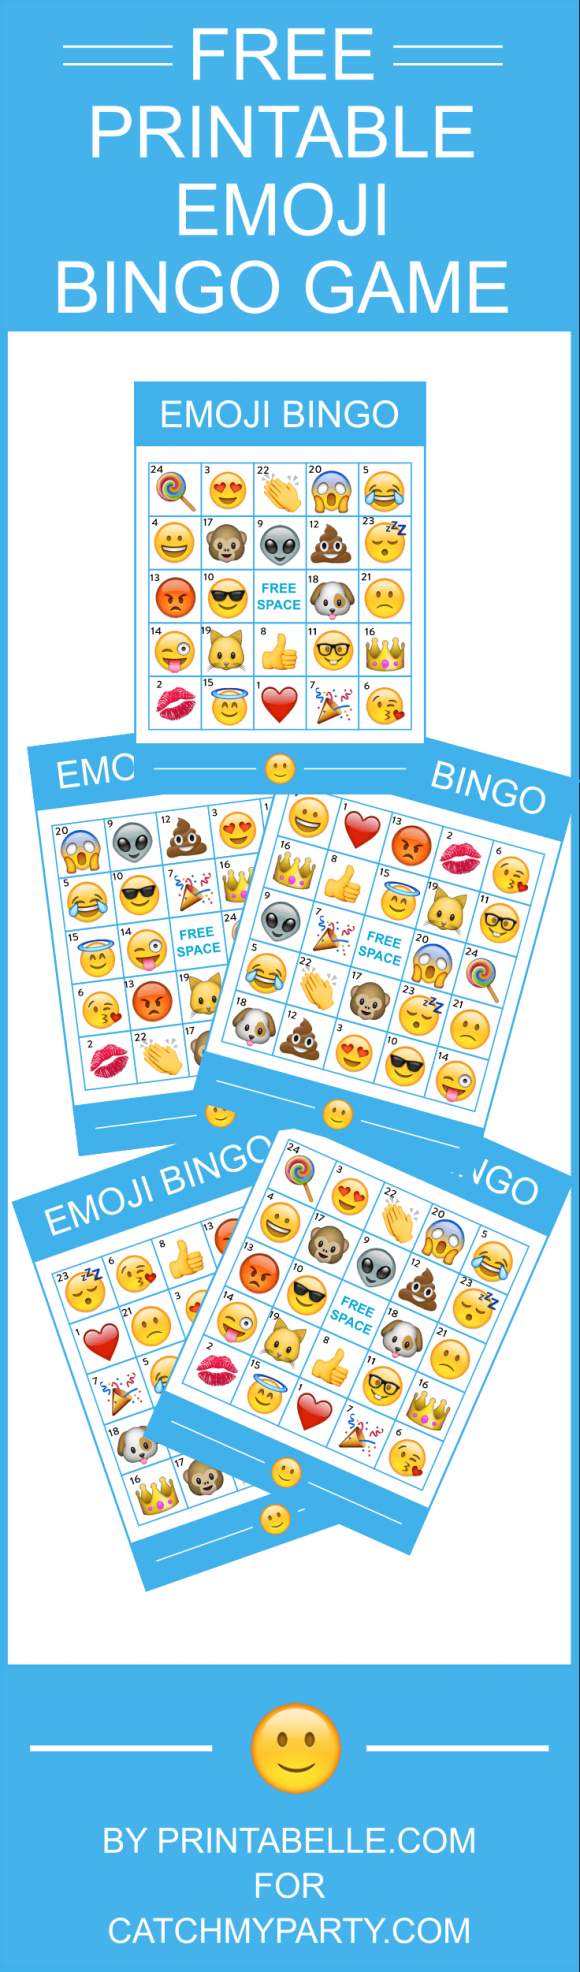 Free Printable Spa Bingo Cards